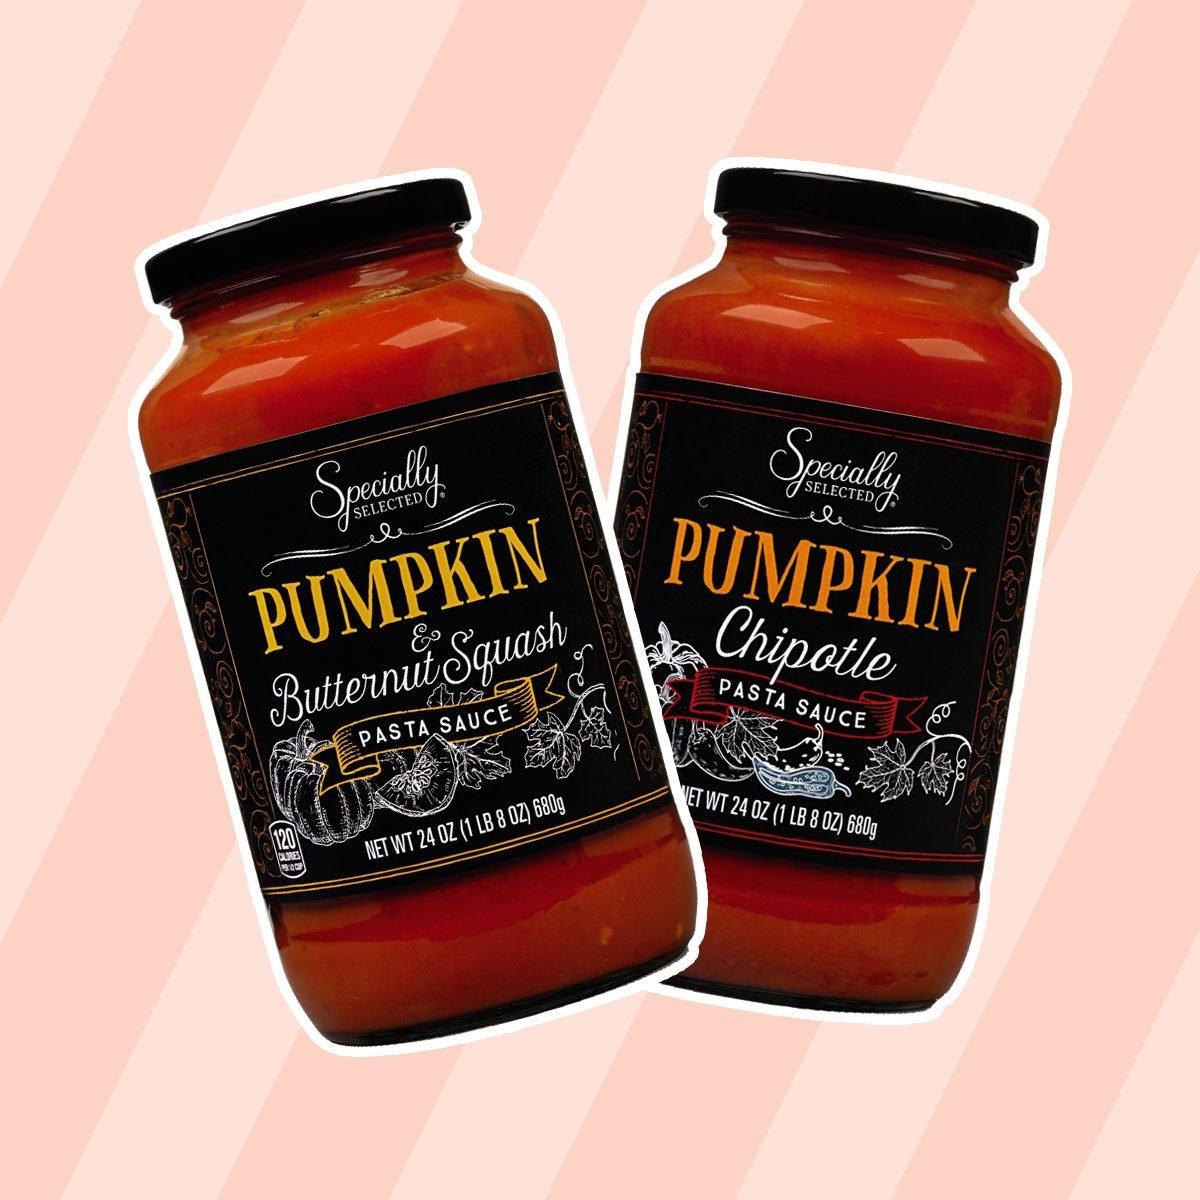 Pumpkin & Butternut Squash and Pumpkin Chipotle Pasta Sauce